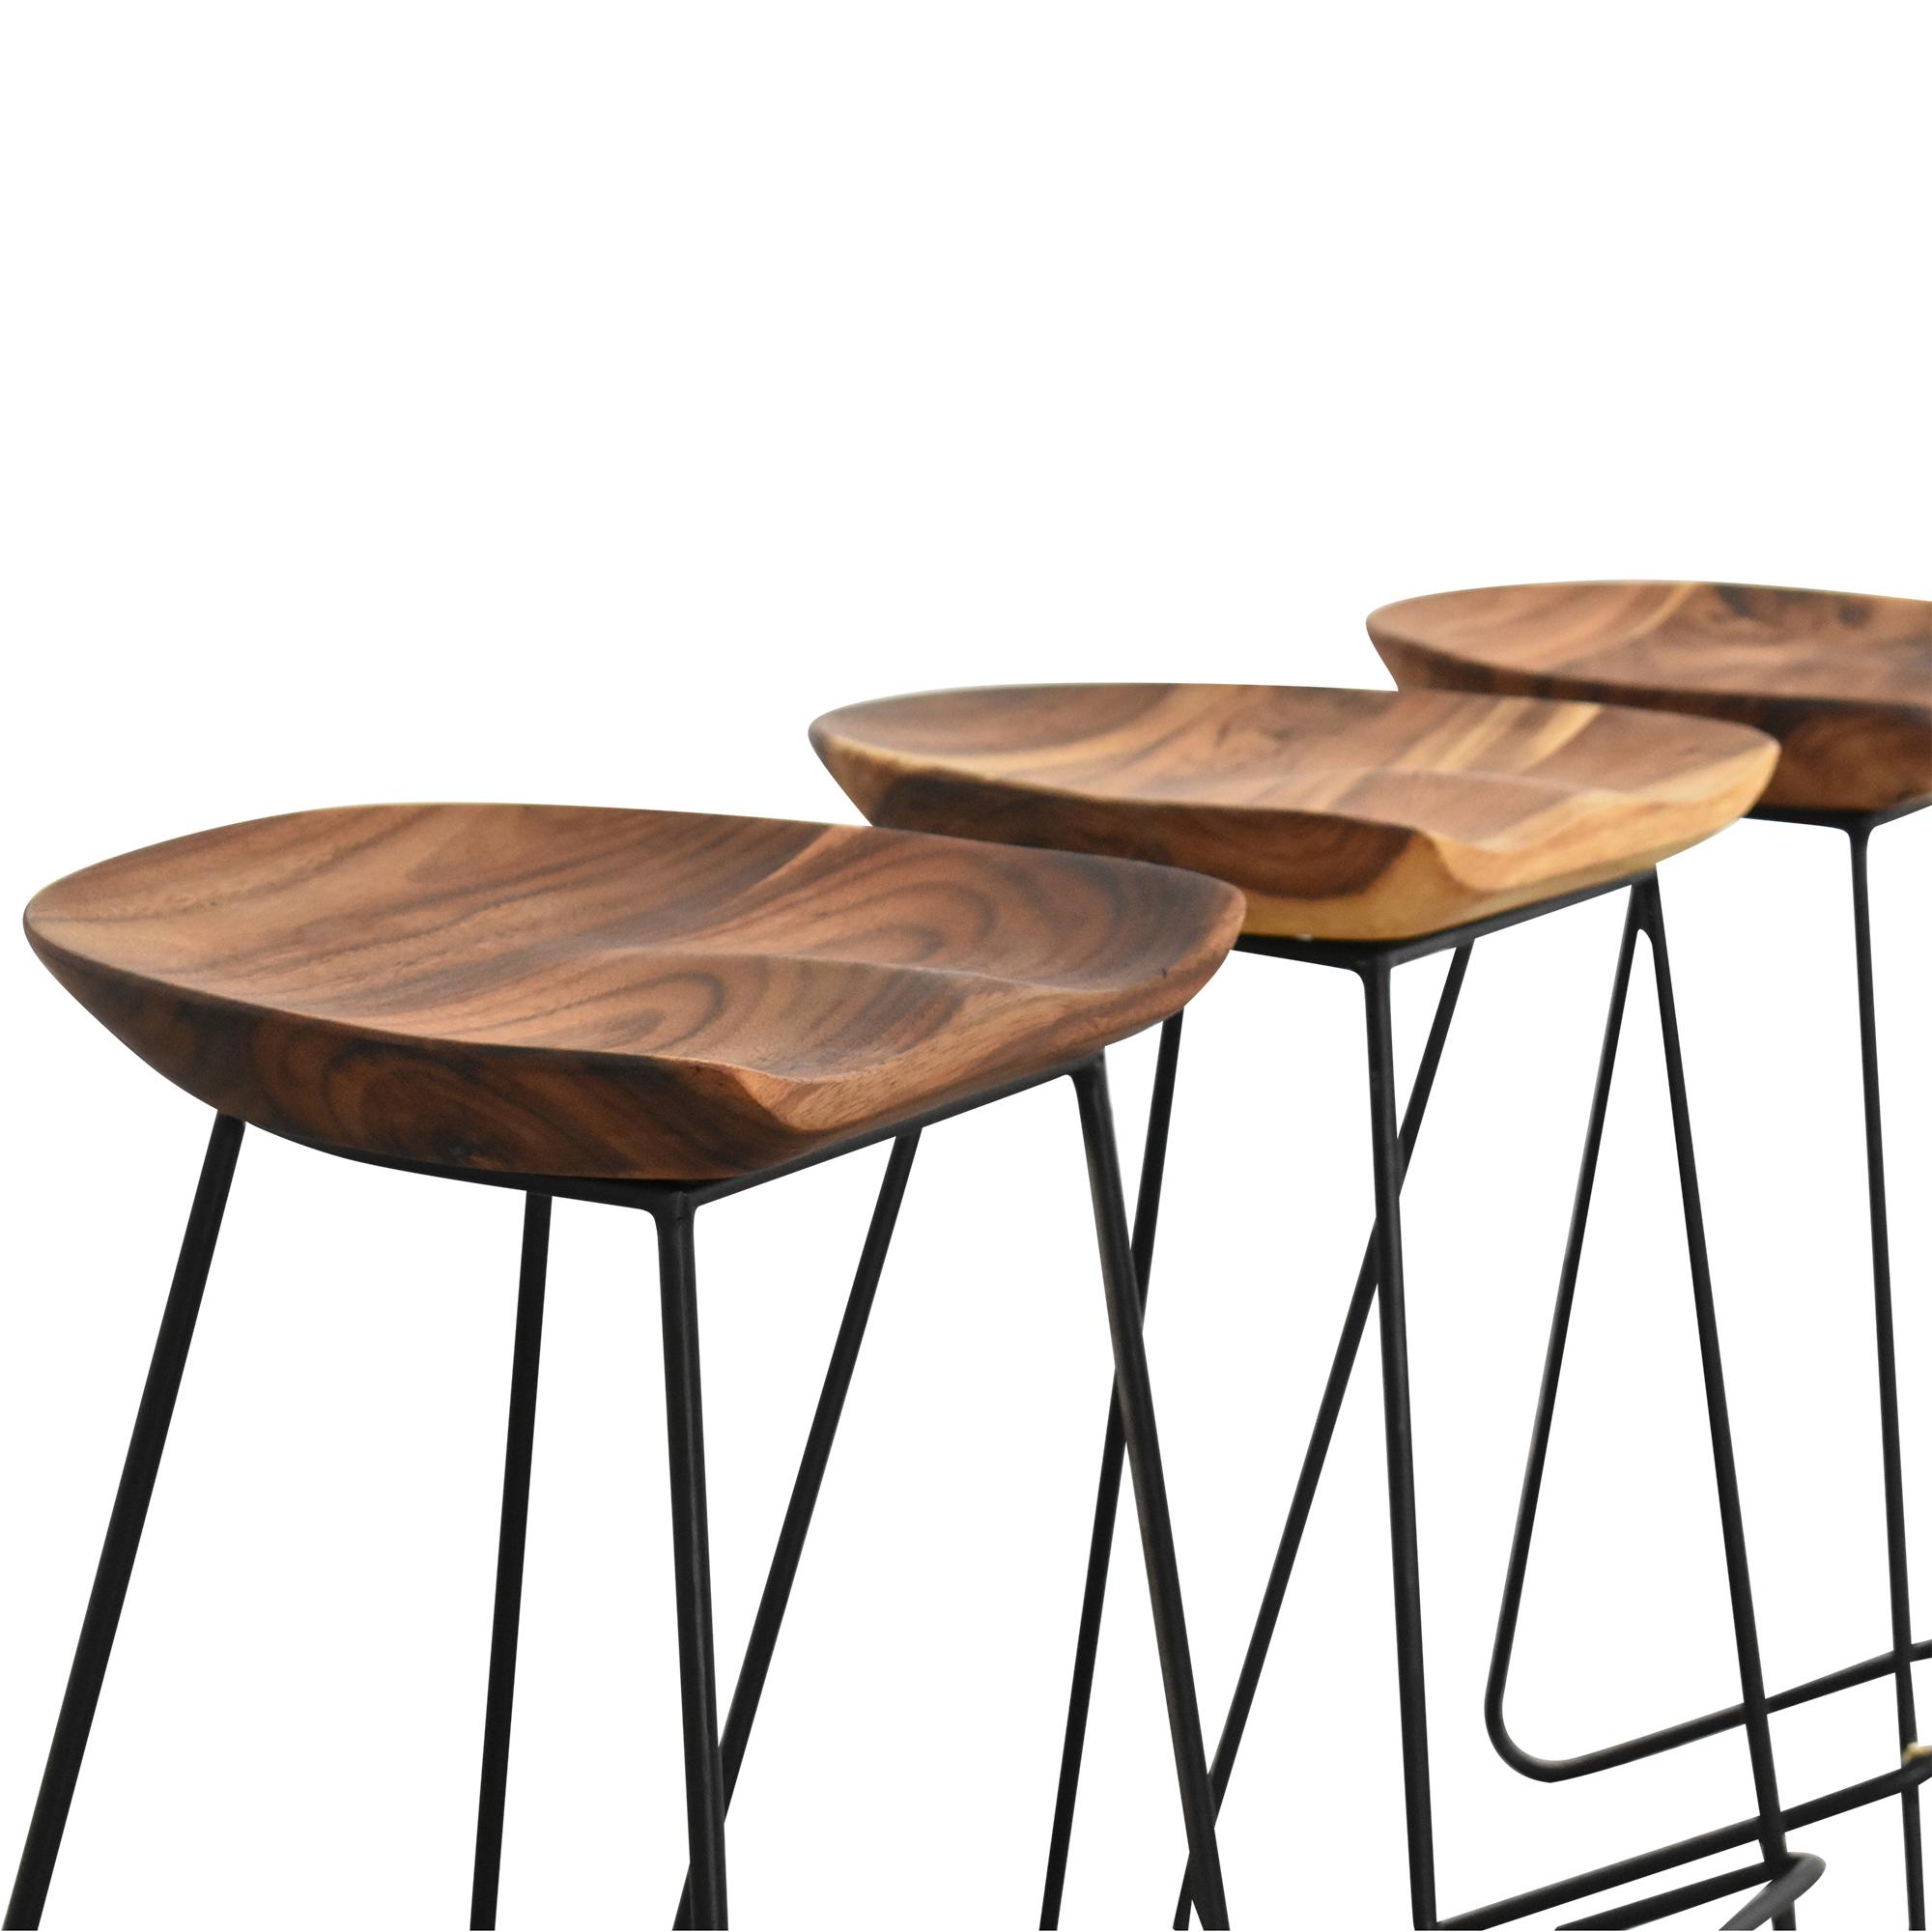 shop Organic Modernism Chicago Counter Stools Organic Modernism Chairs